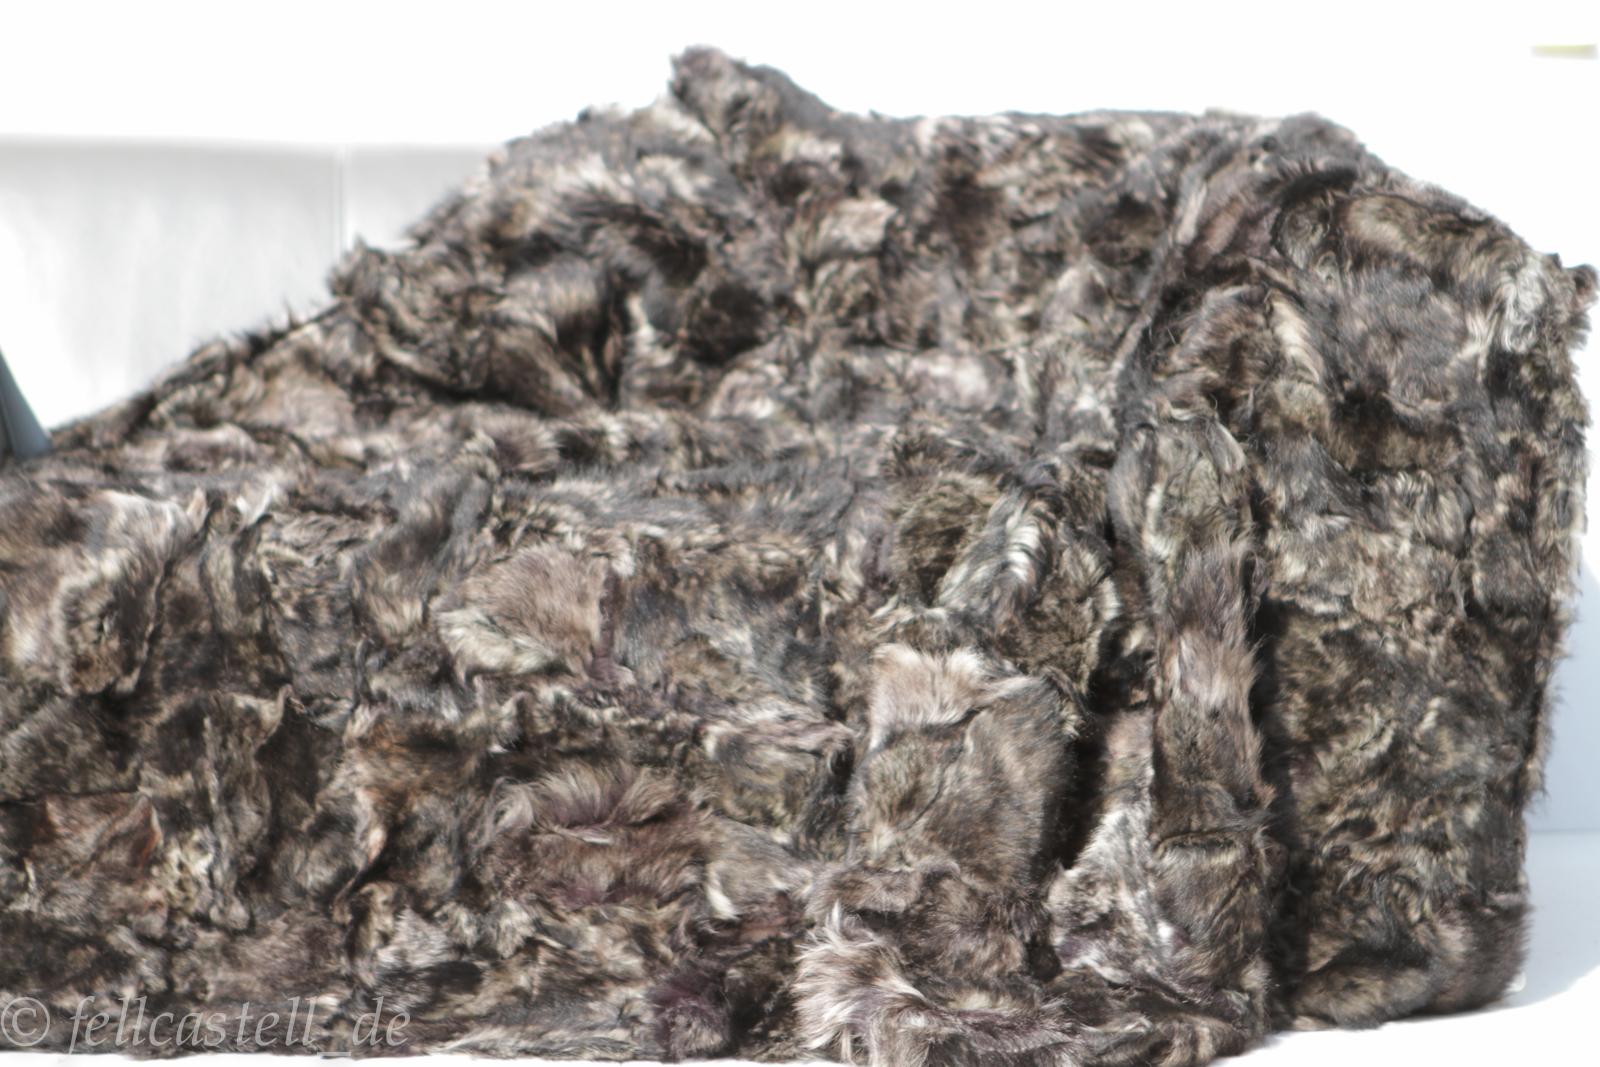 Lammfelldecke Toscana Lammfell 200 x 155 cm Brauntöne #64